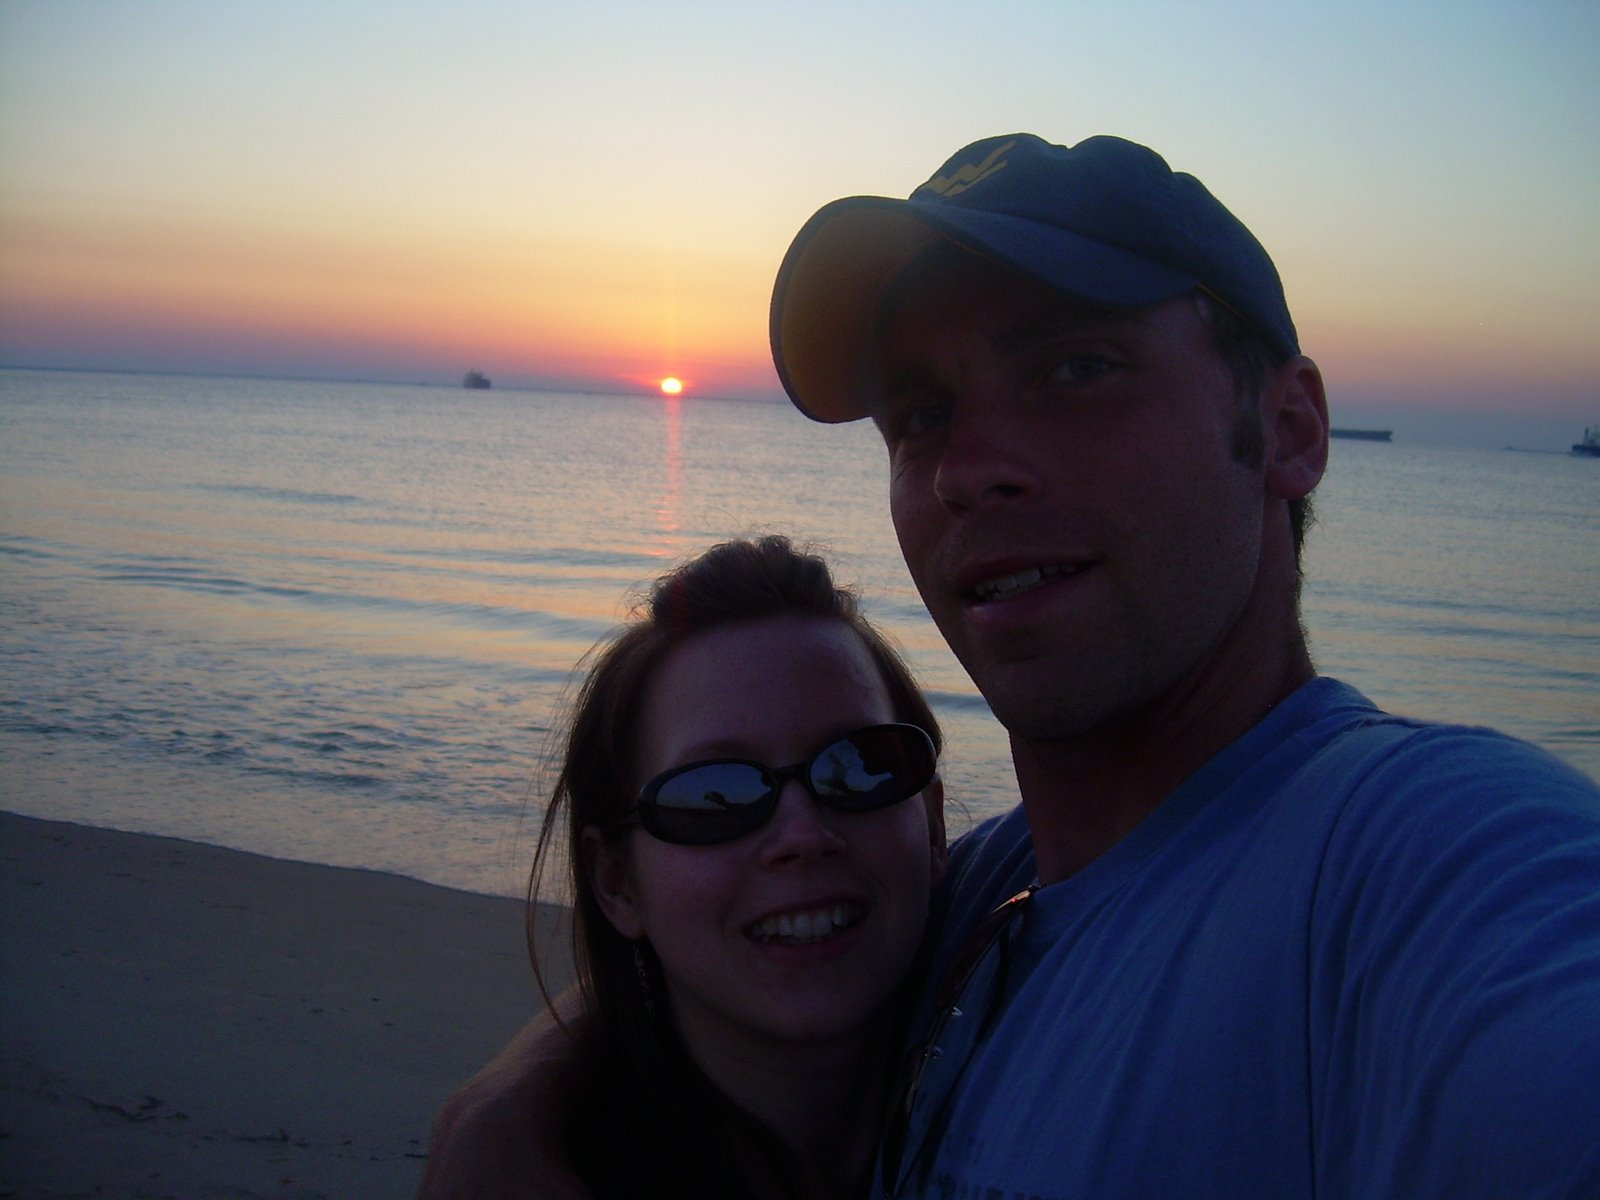 [Virginia+Beach+June+]